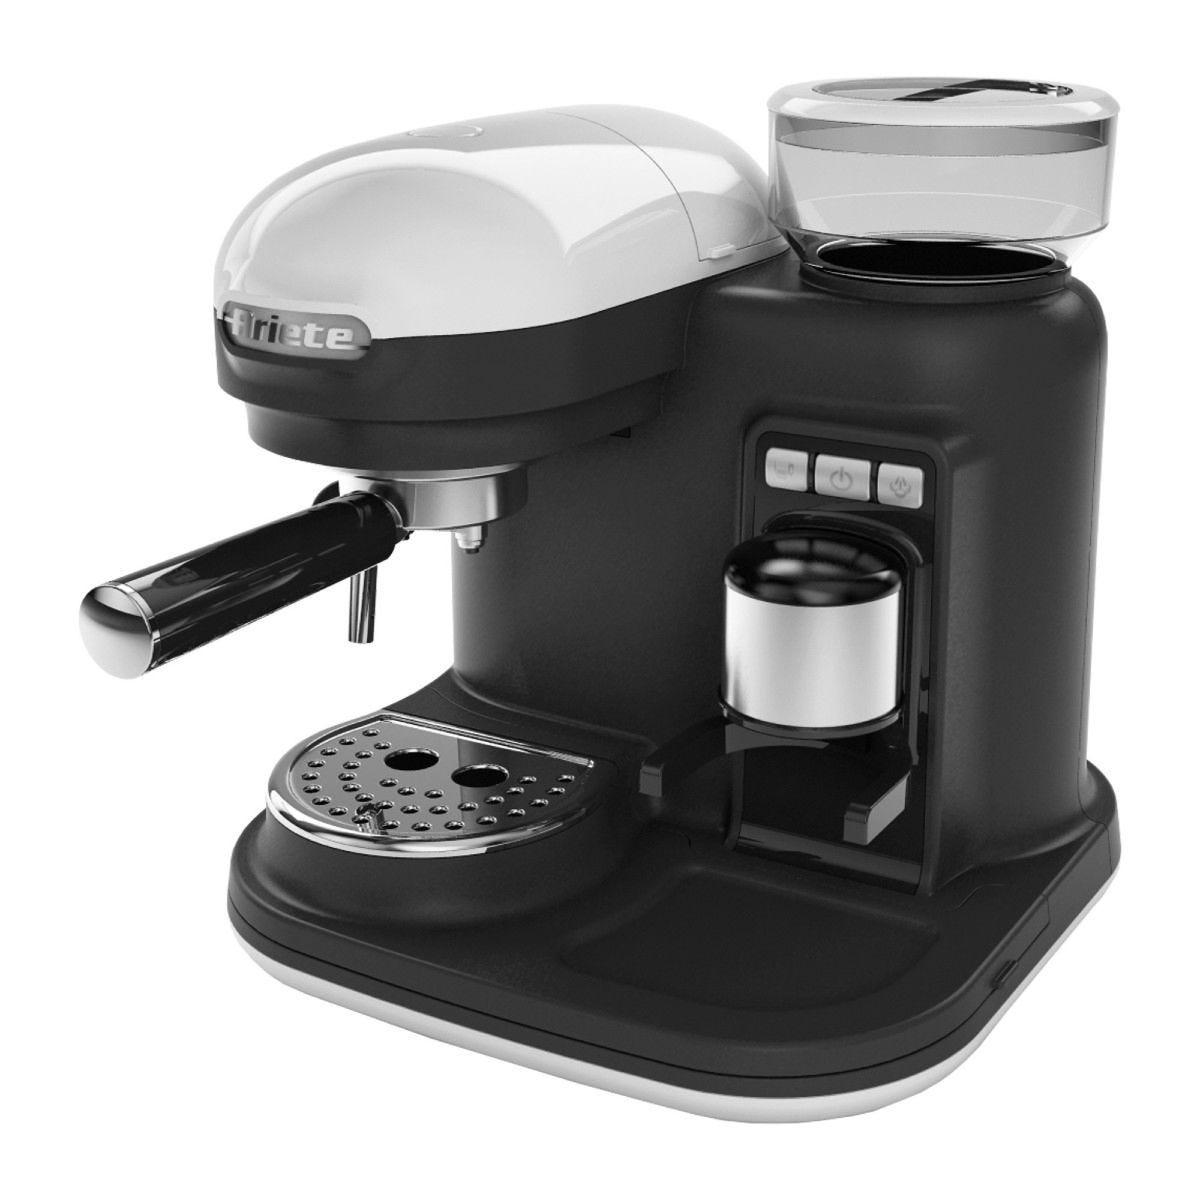 Ariette AR1320 Moderna Espresso Coffee Maker - White